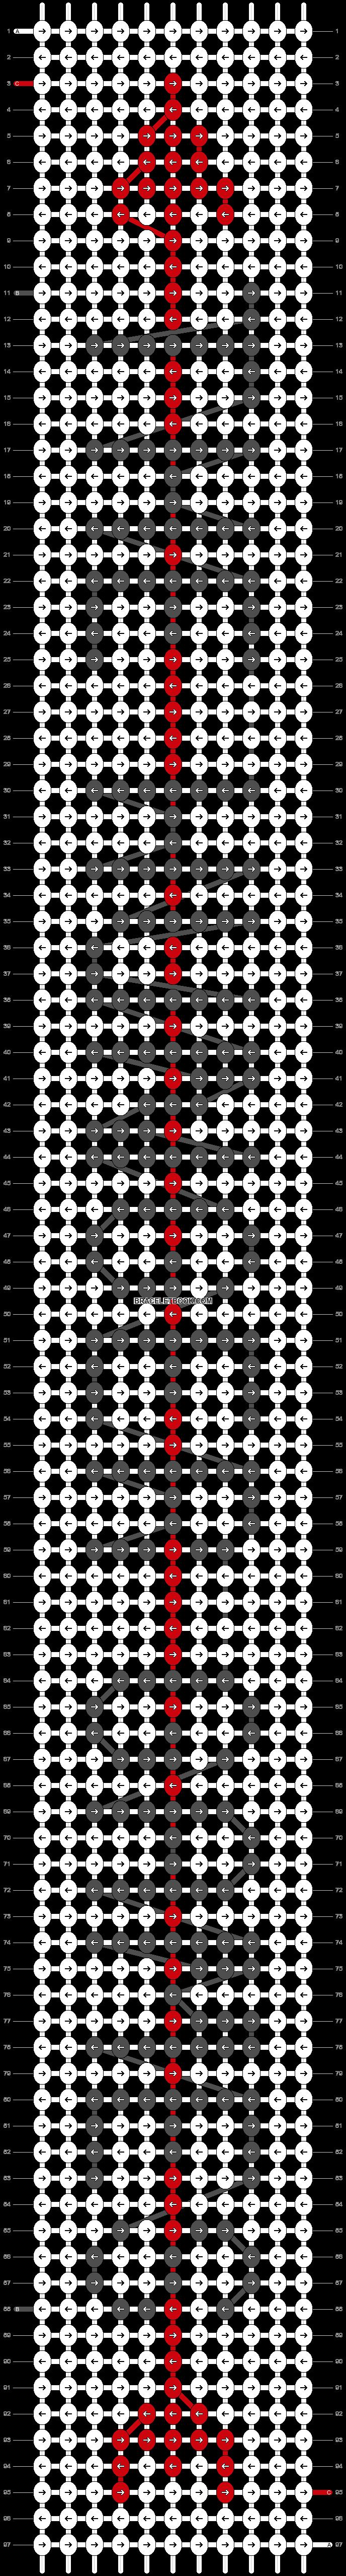 Alpha pattern #18412 pattern